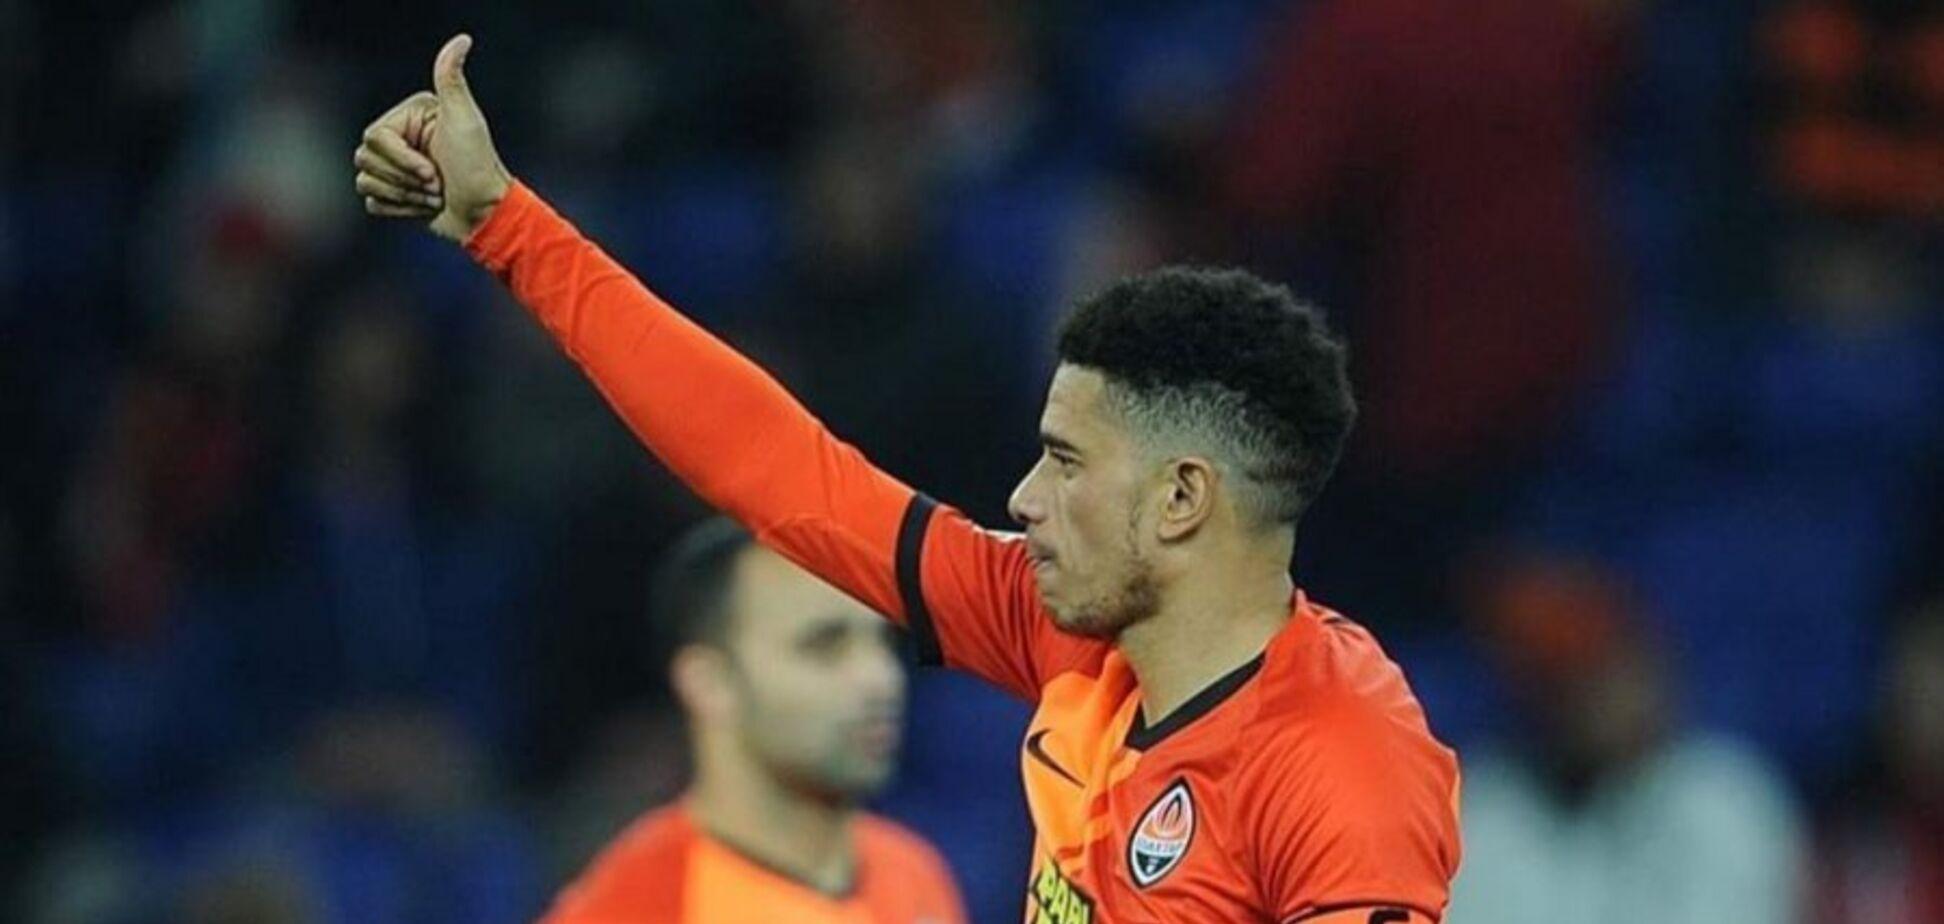 'Не подумал': Тайсон сделал признание о скандале в матче с 'Динамо'